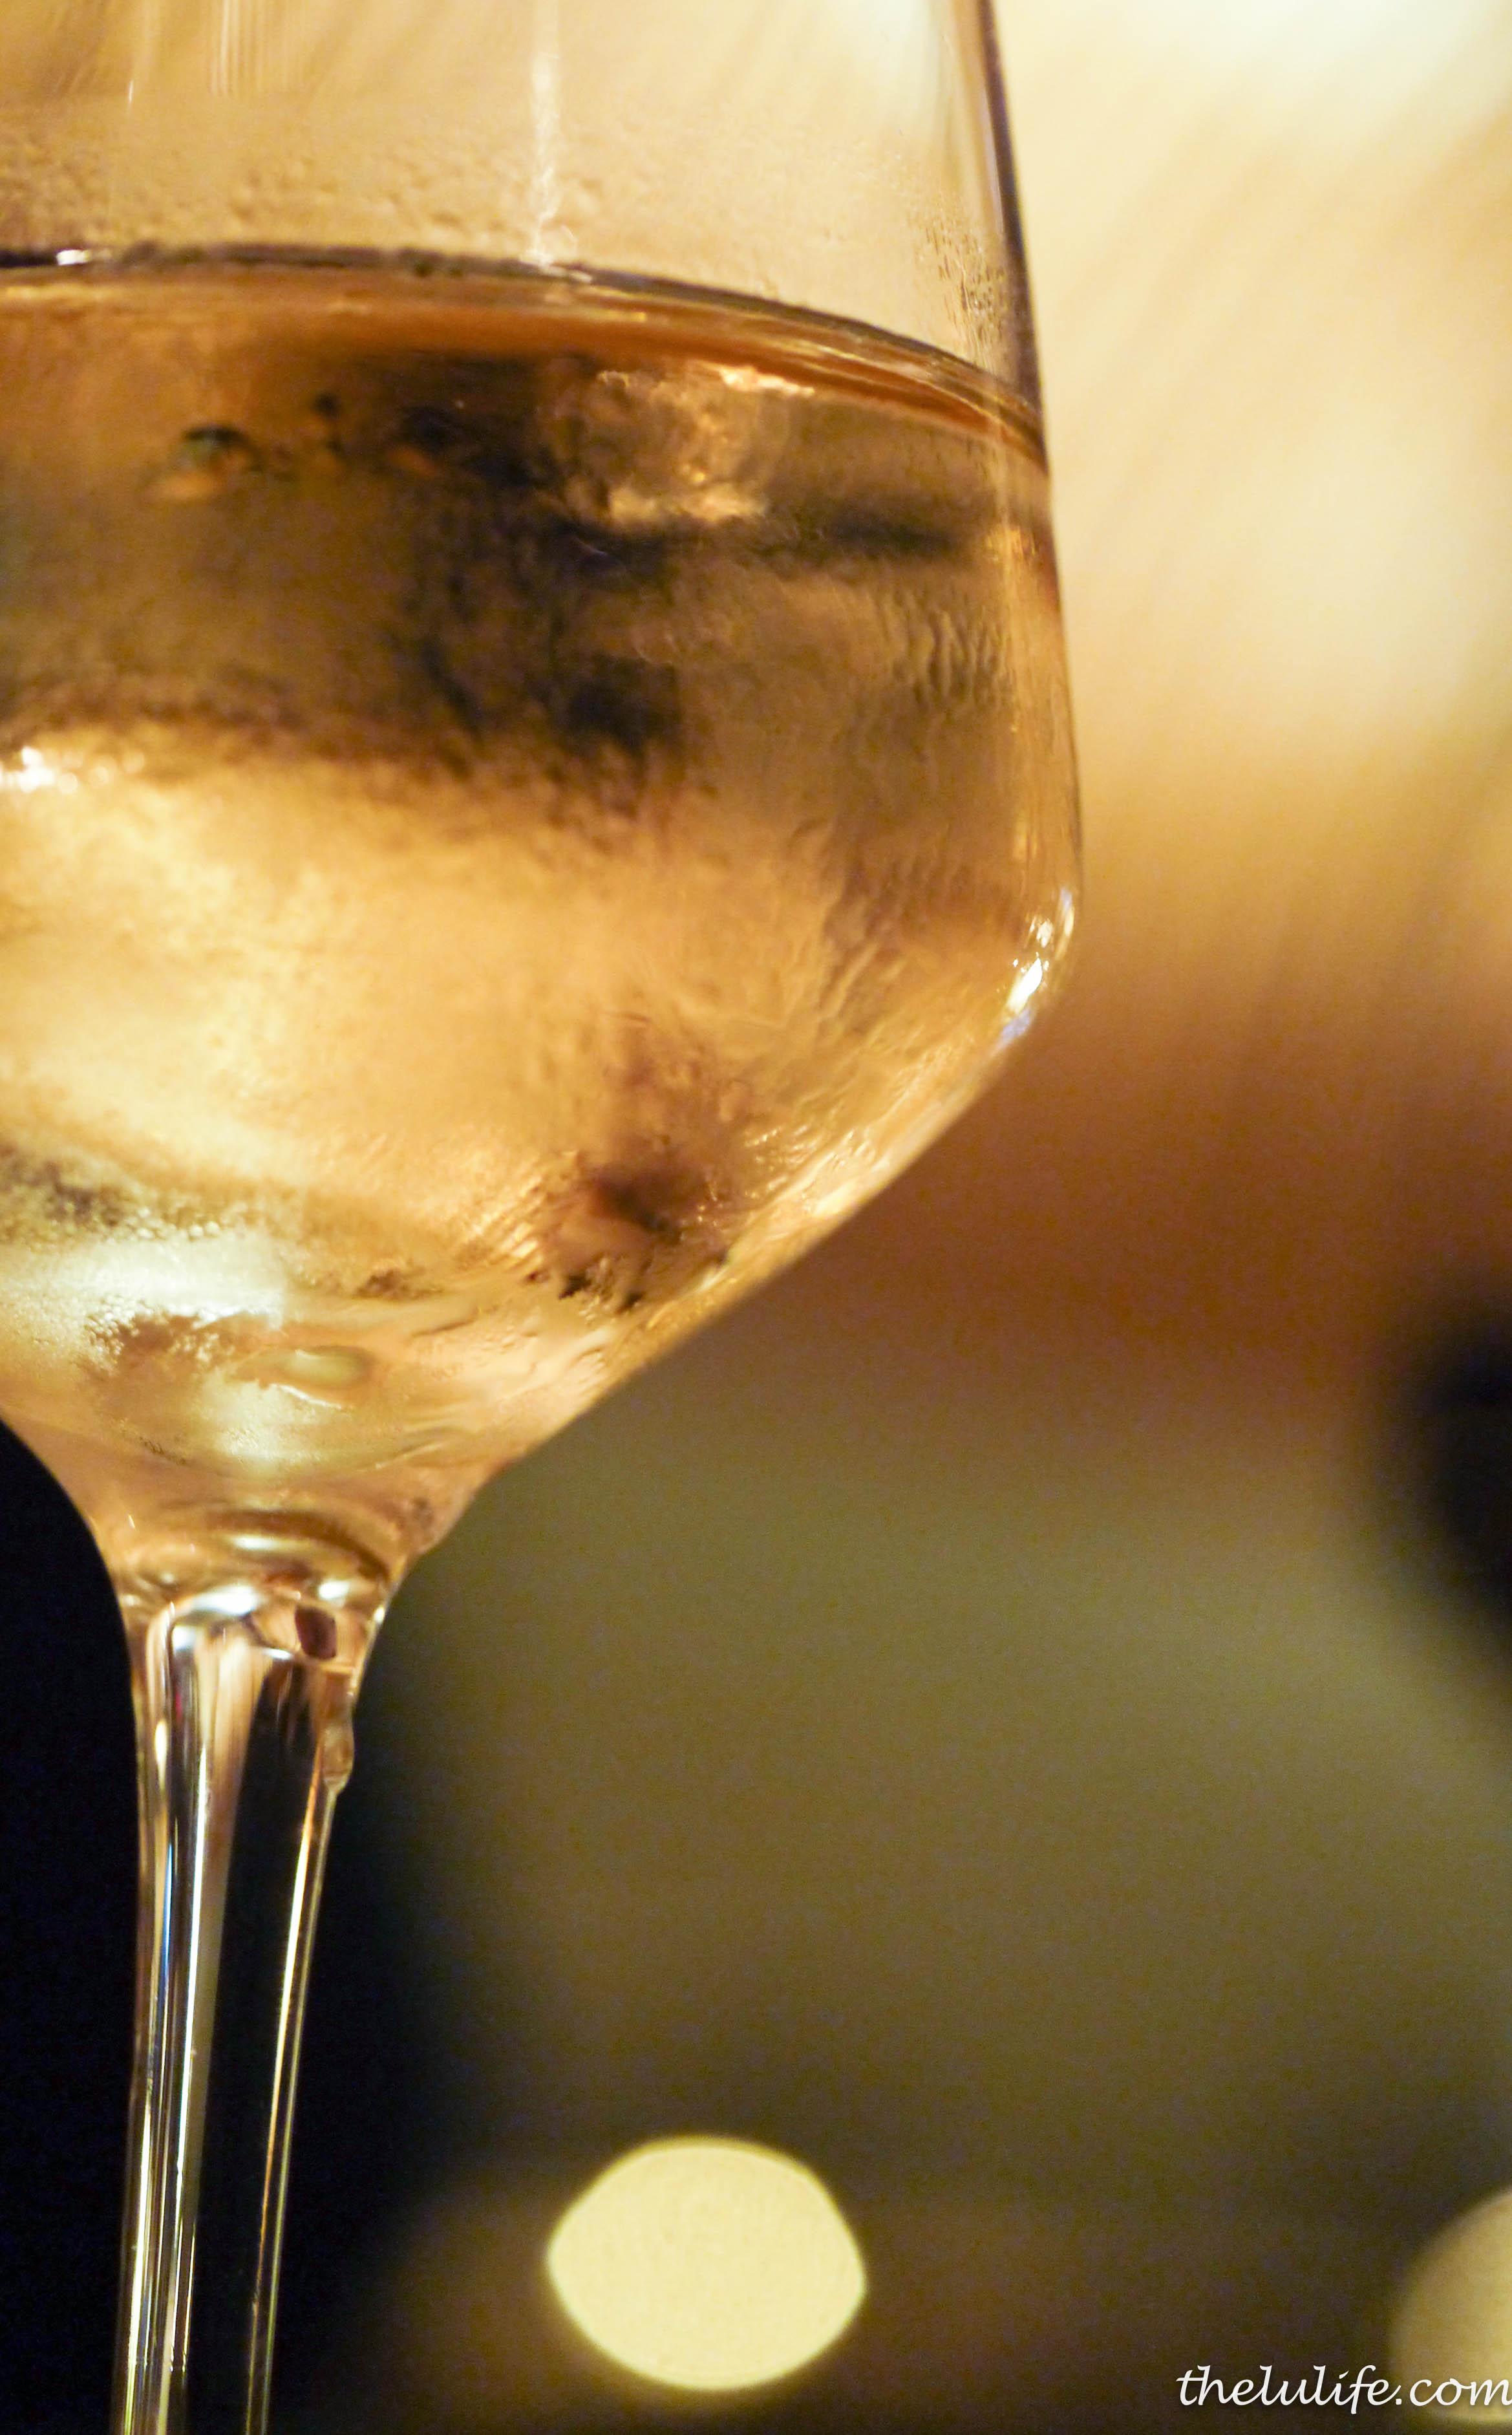 Figure 3. Sauvignon blanc from Iona Winery